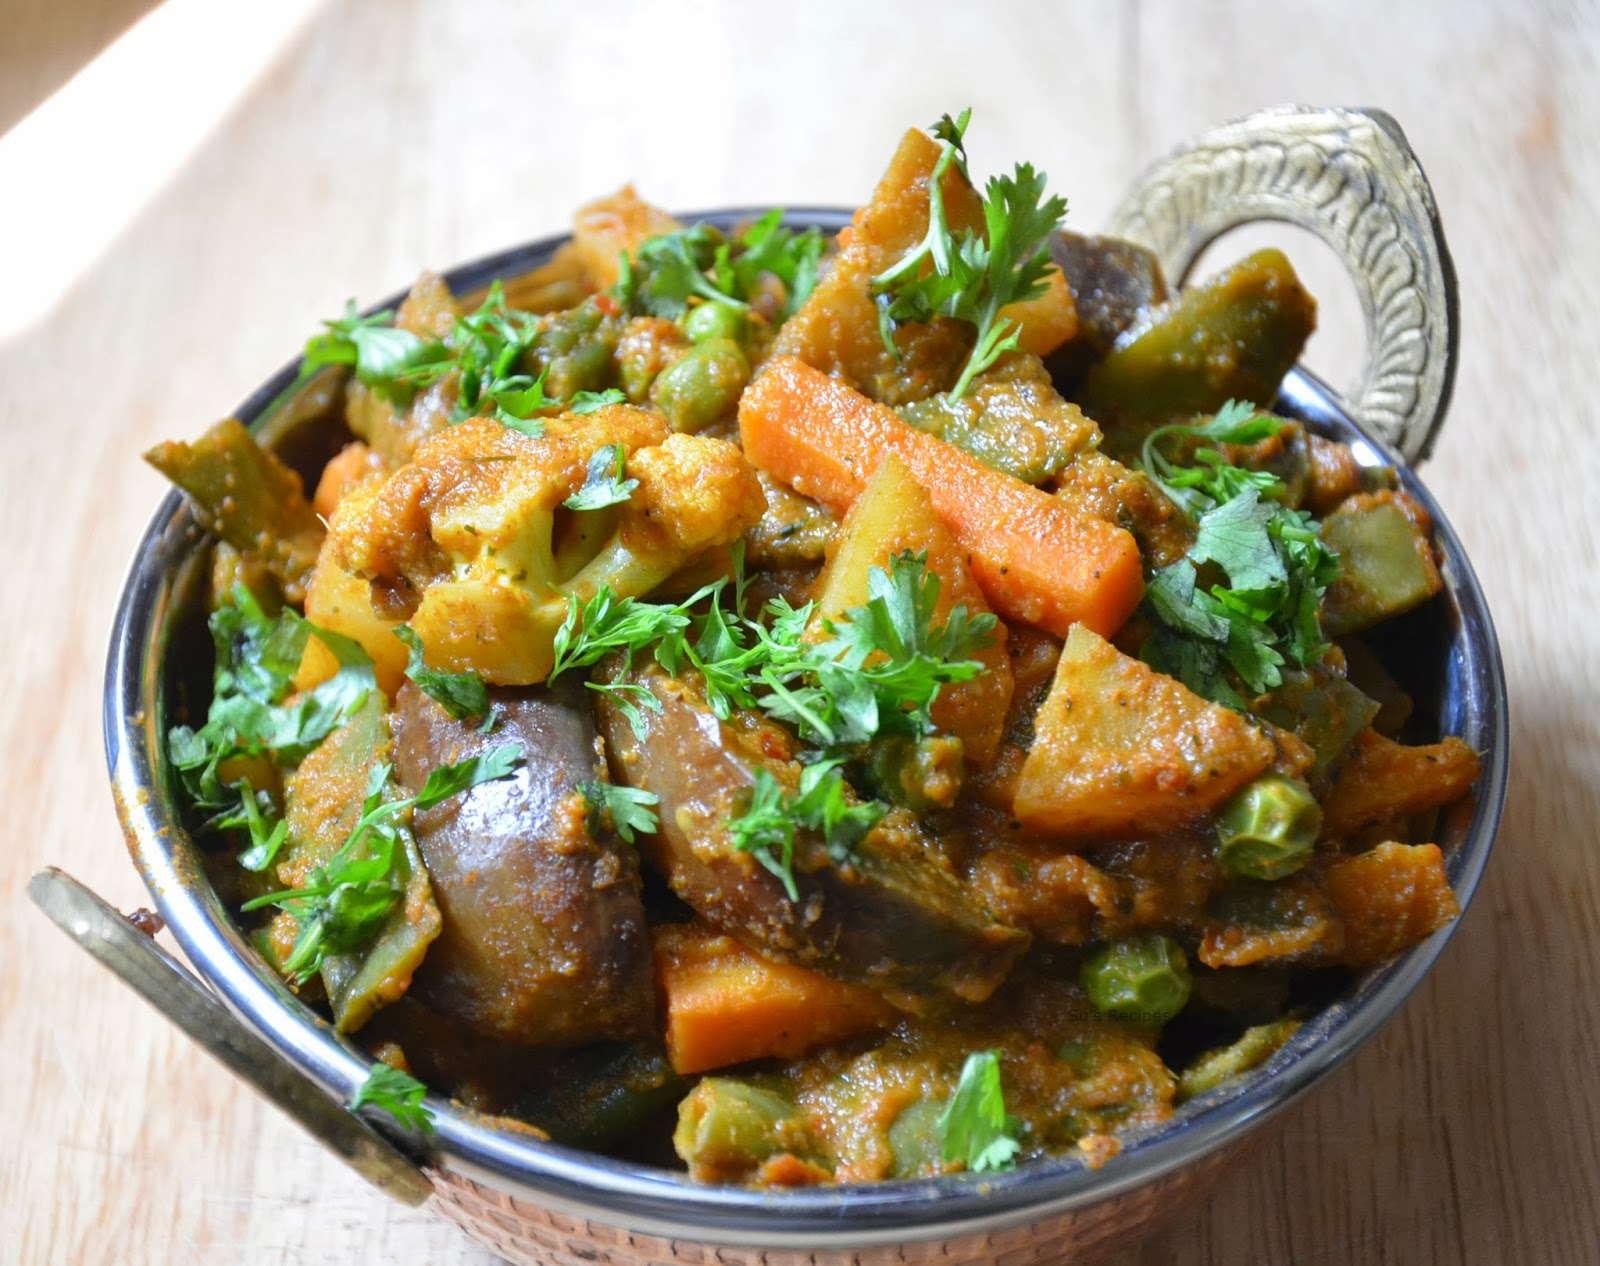 mix-vegetable-curry-stir-fry-